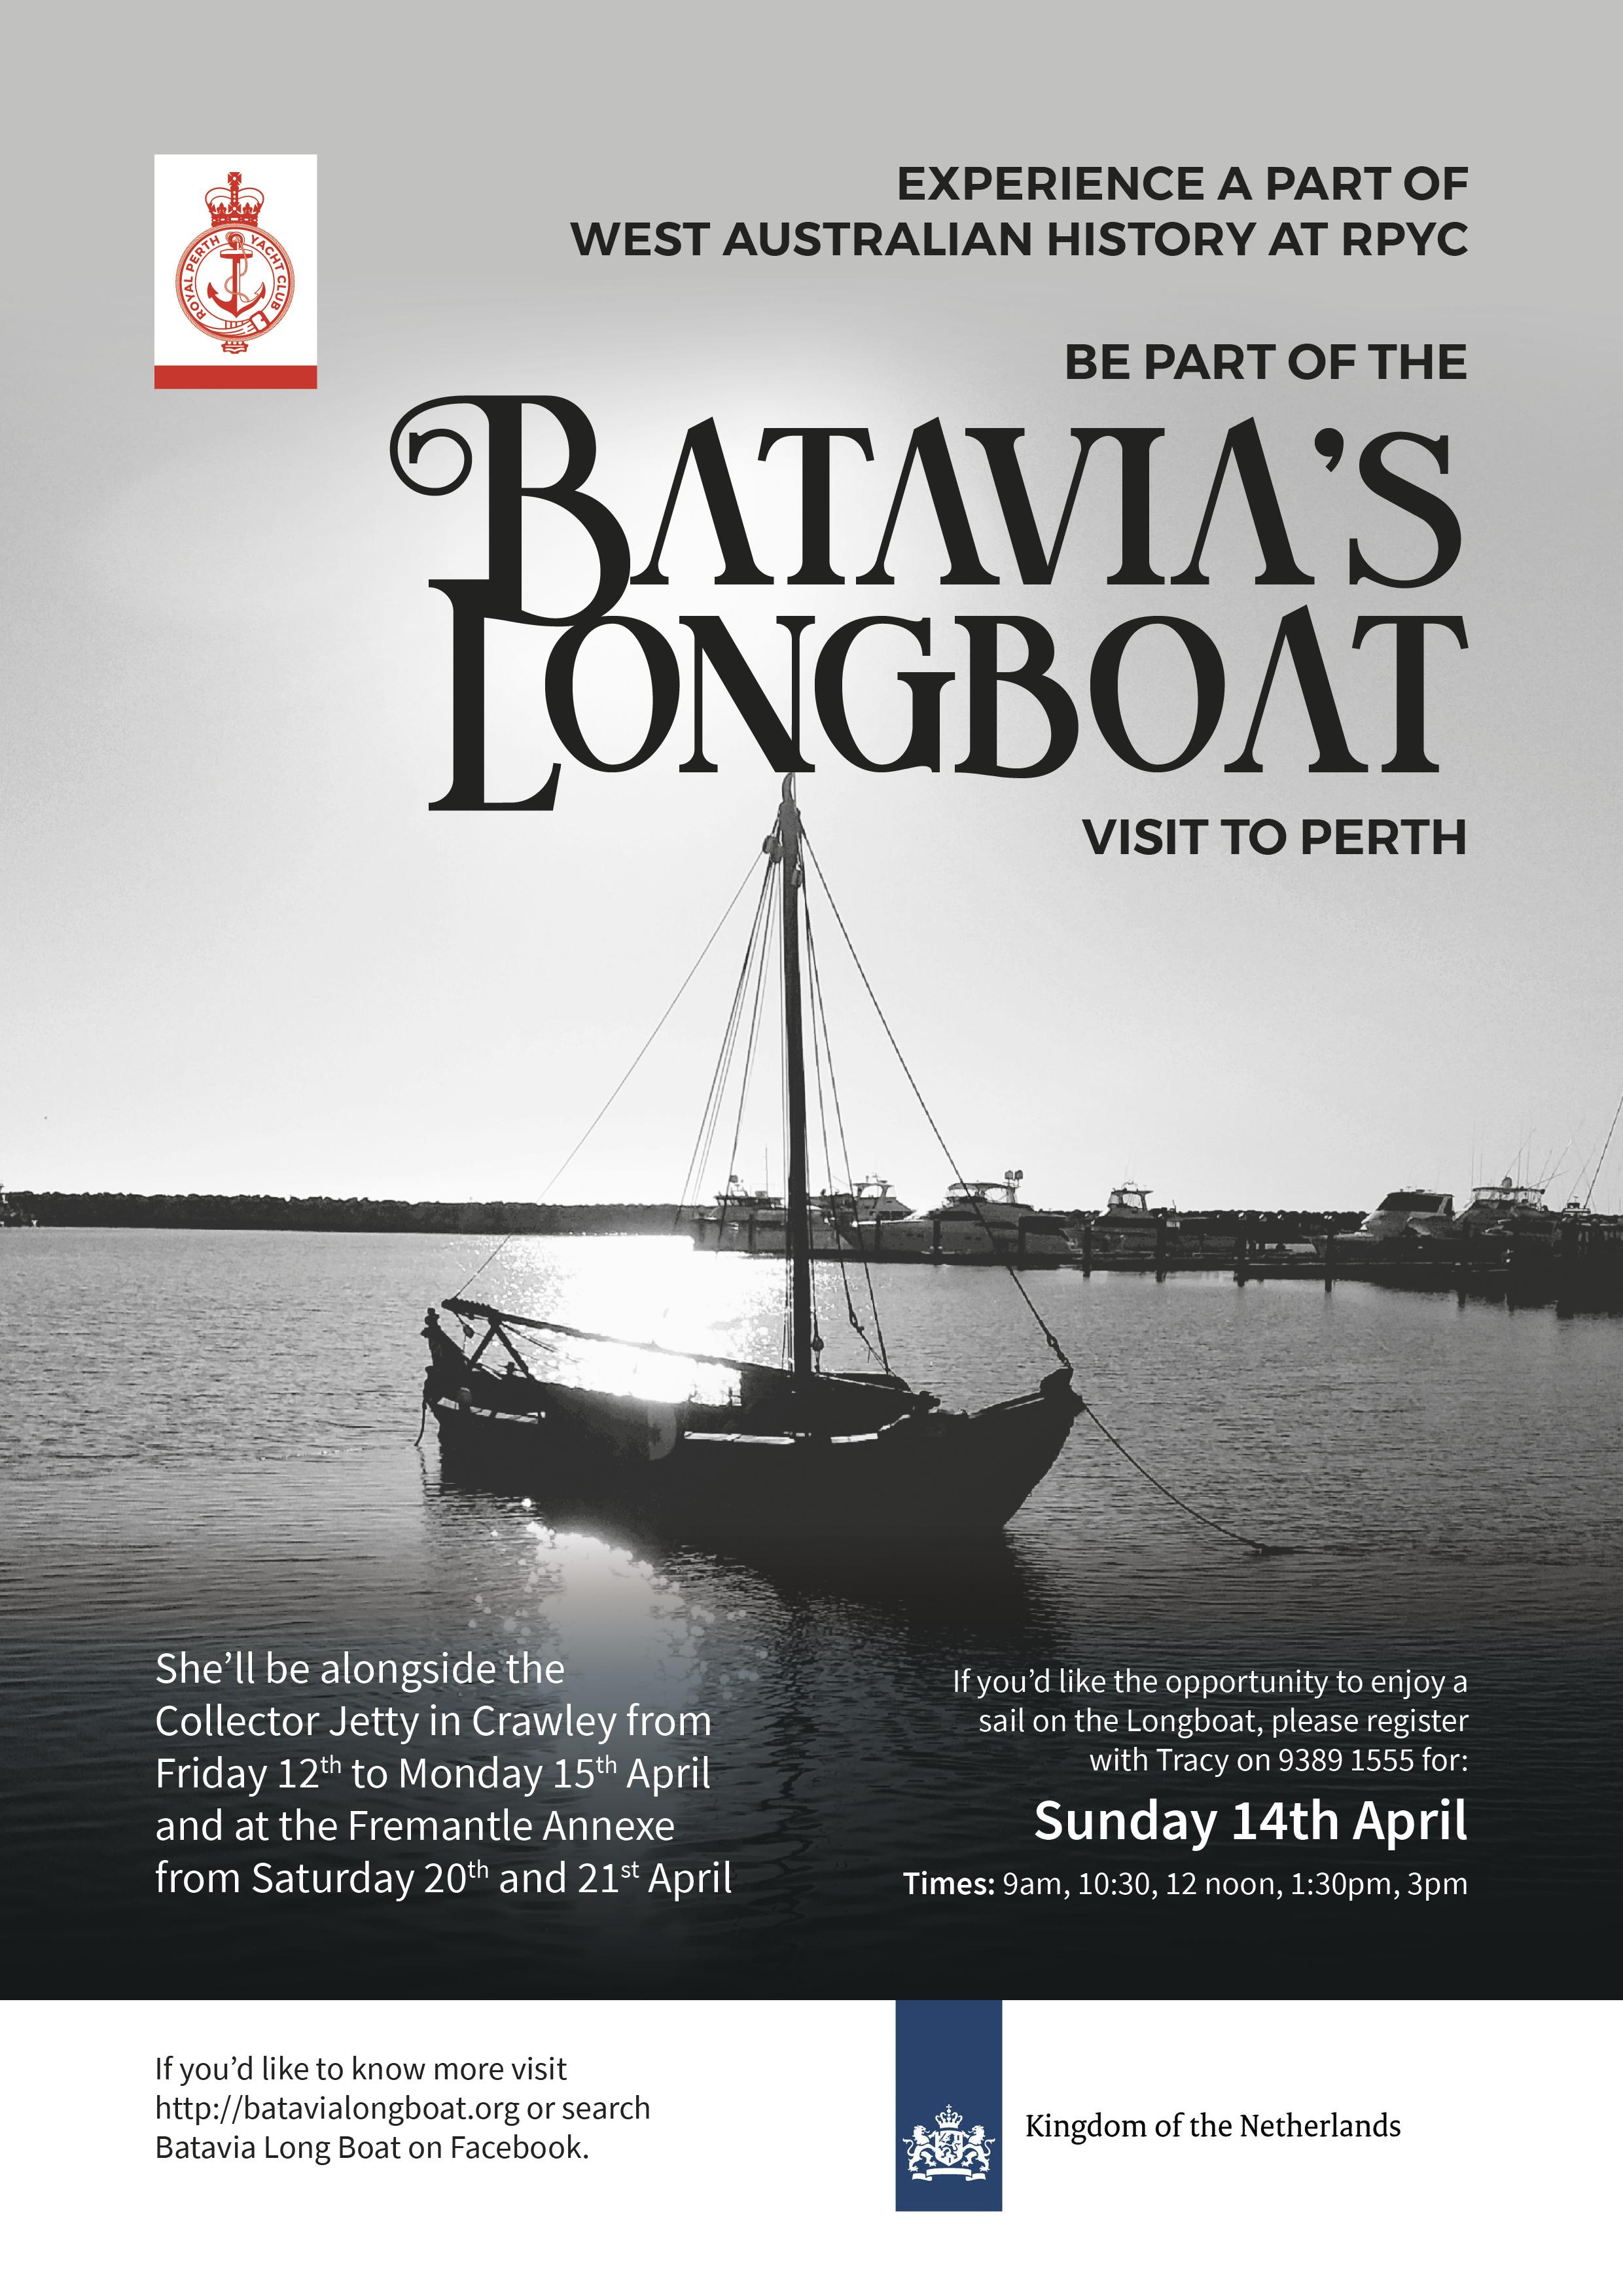 RPYC Batavia Longboat A4 03 2019